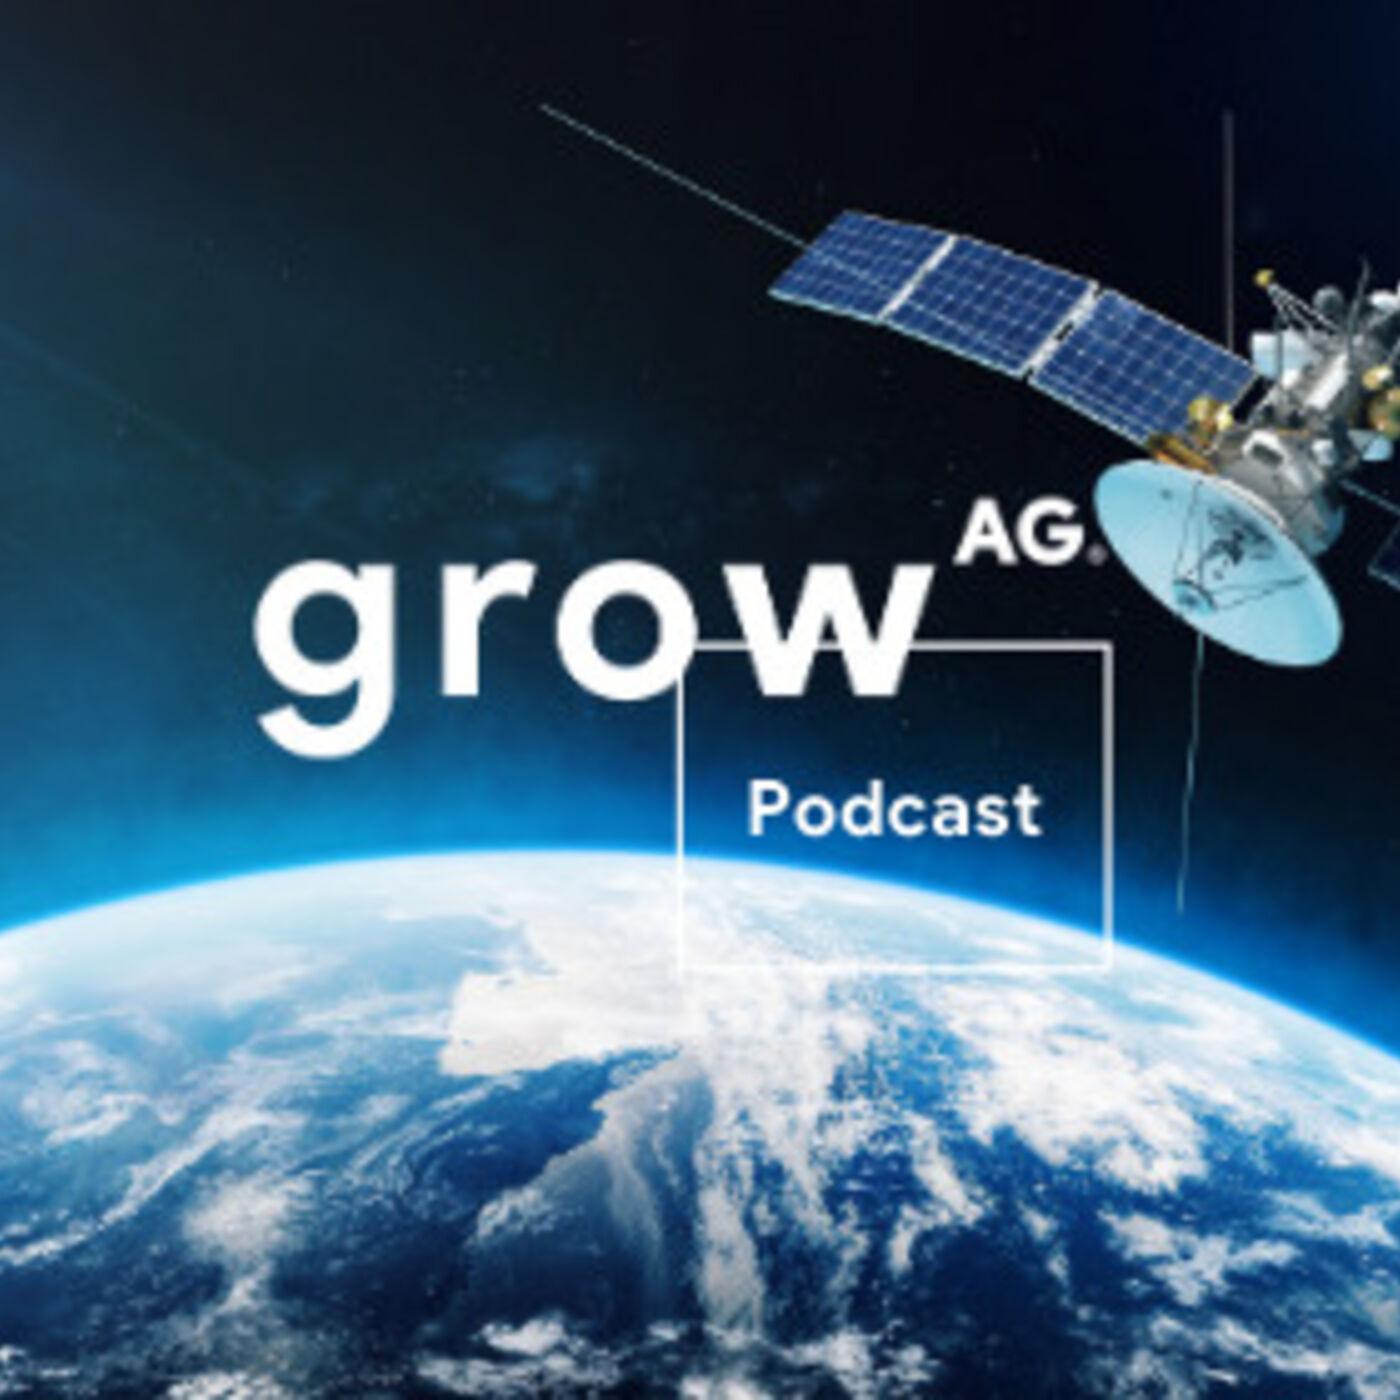 growAG. – showcasing Australian innovation to the world